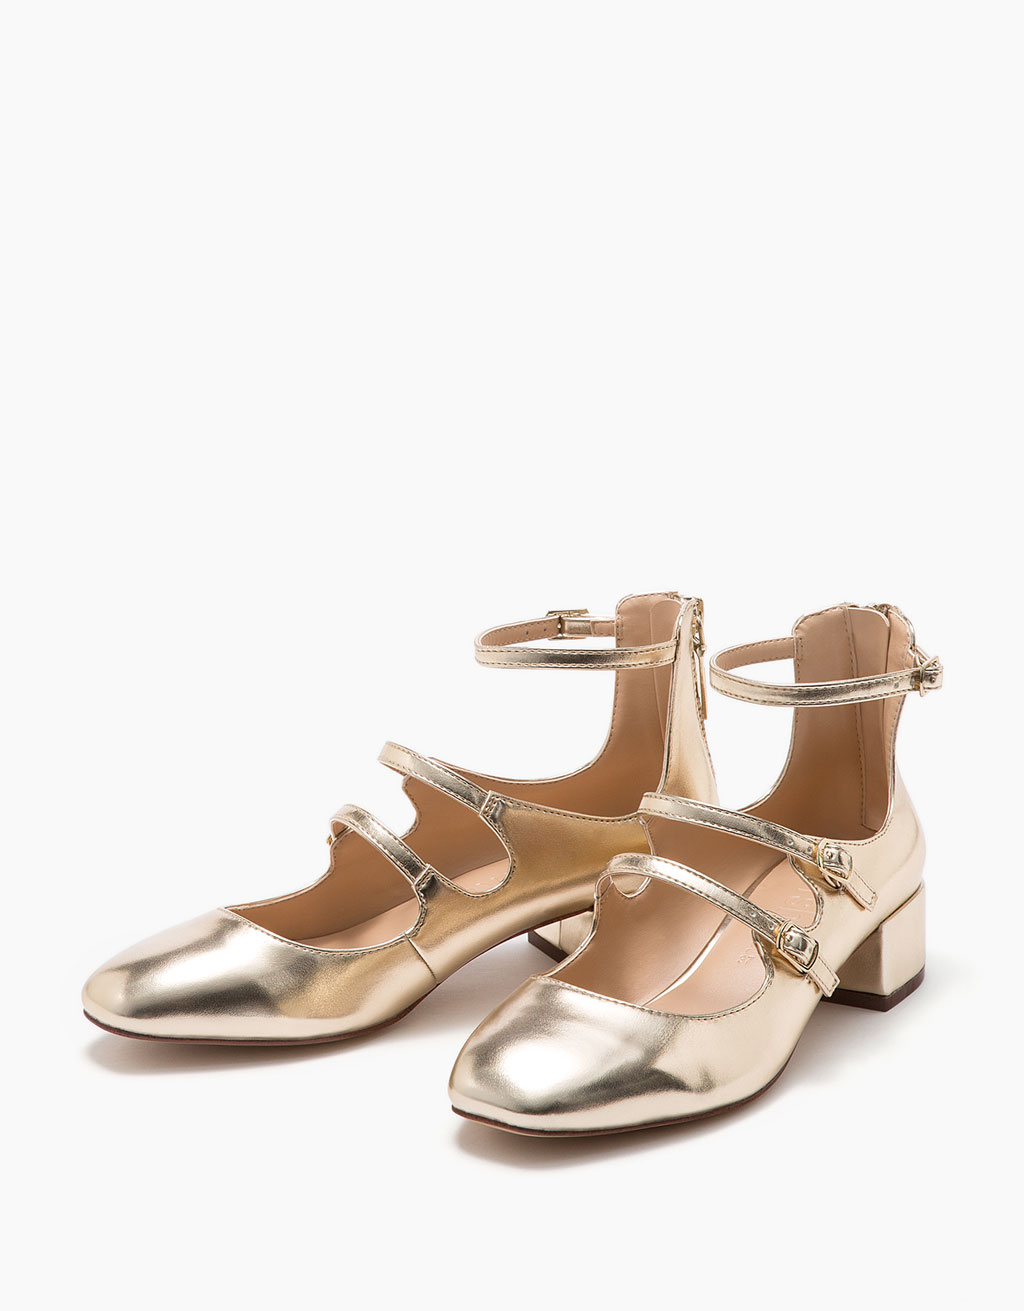 Heeled ballerina shoes with shiny metallic straps